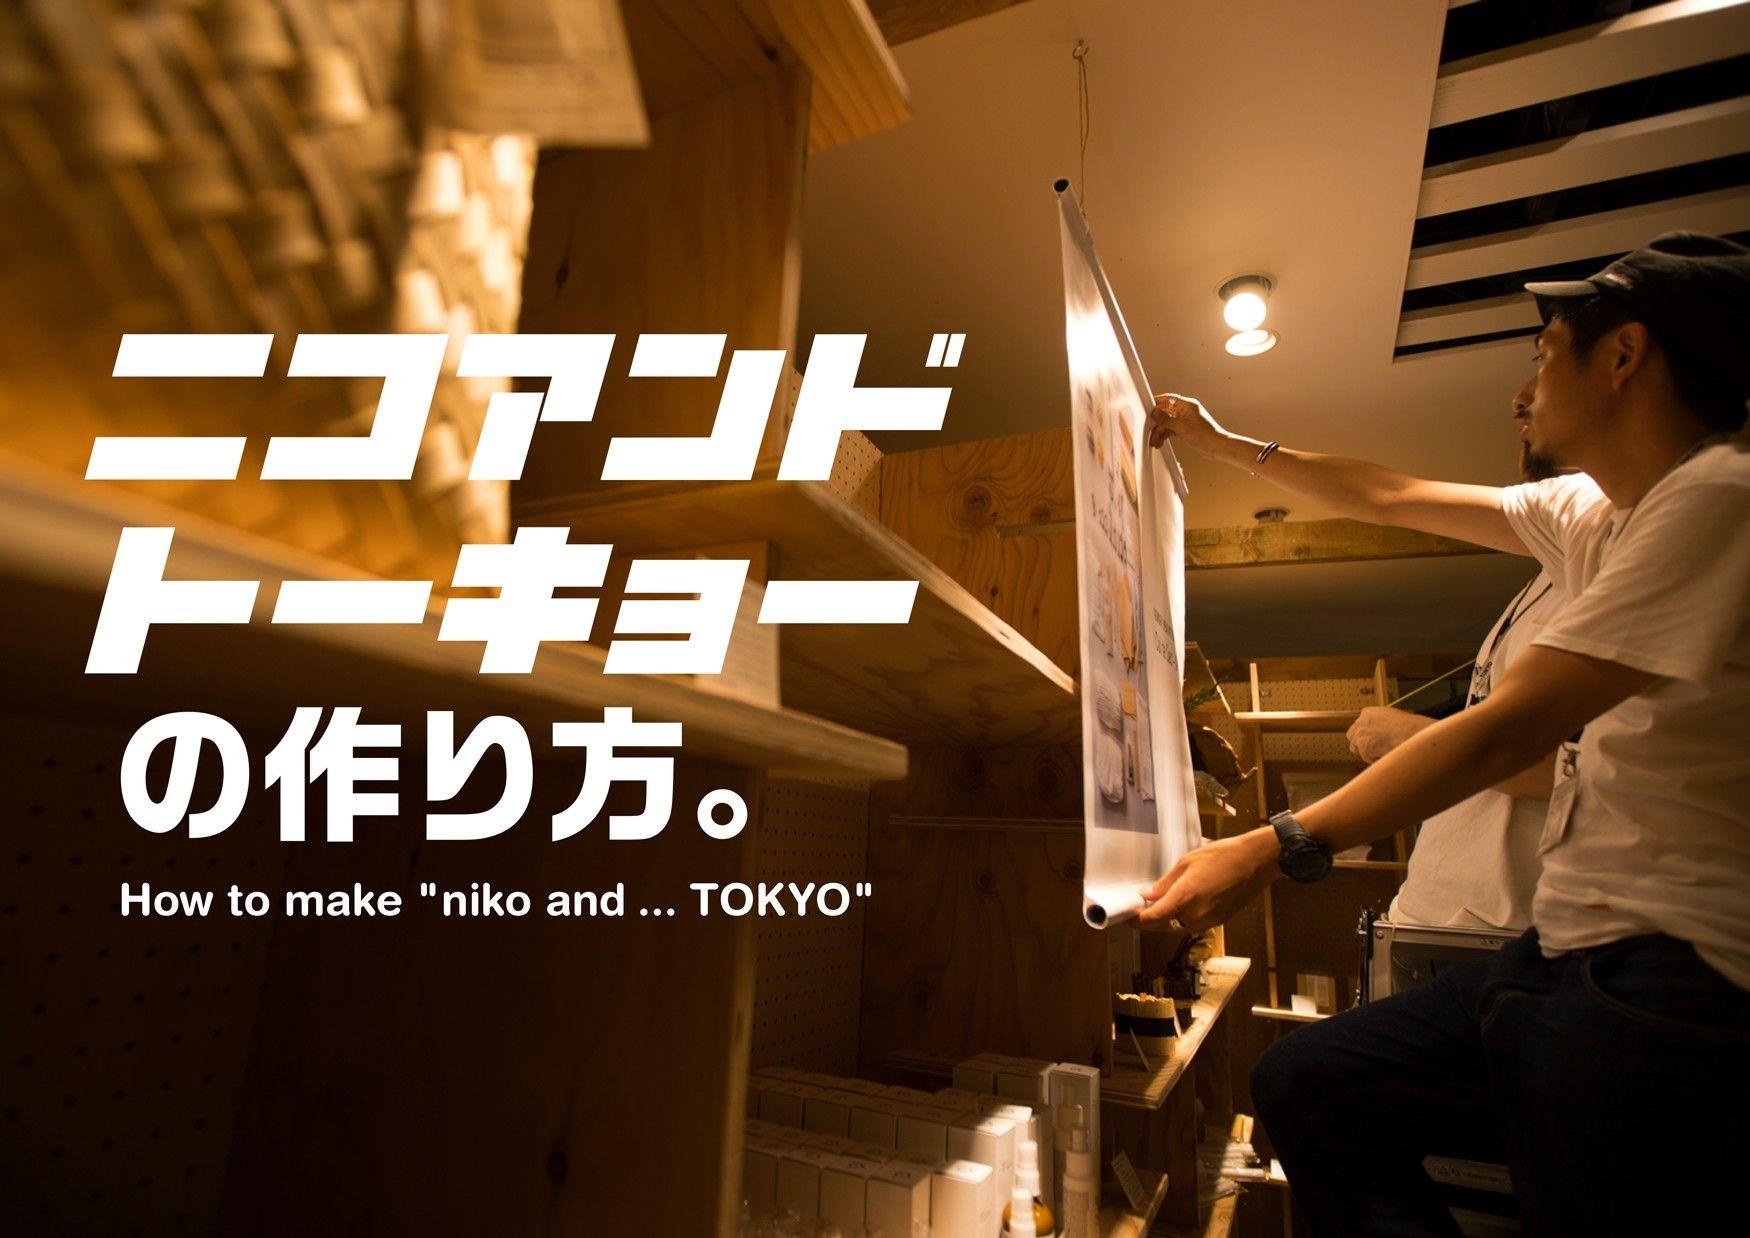 Niko And Tokyo Diyで生み出される圧巻のショップディスプレイ